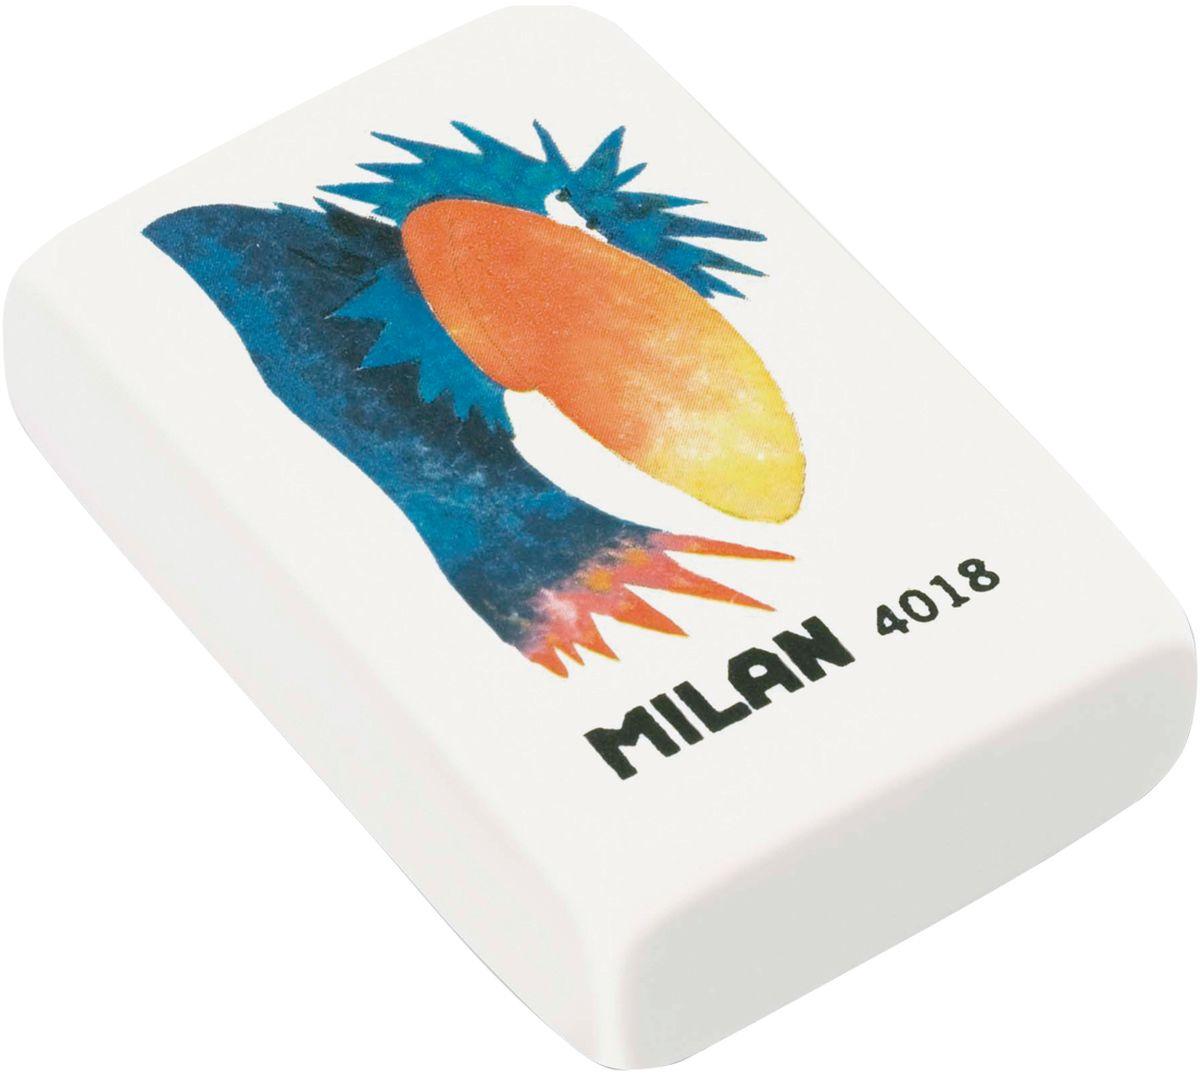 Milan Ластик 4018